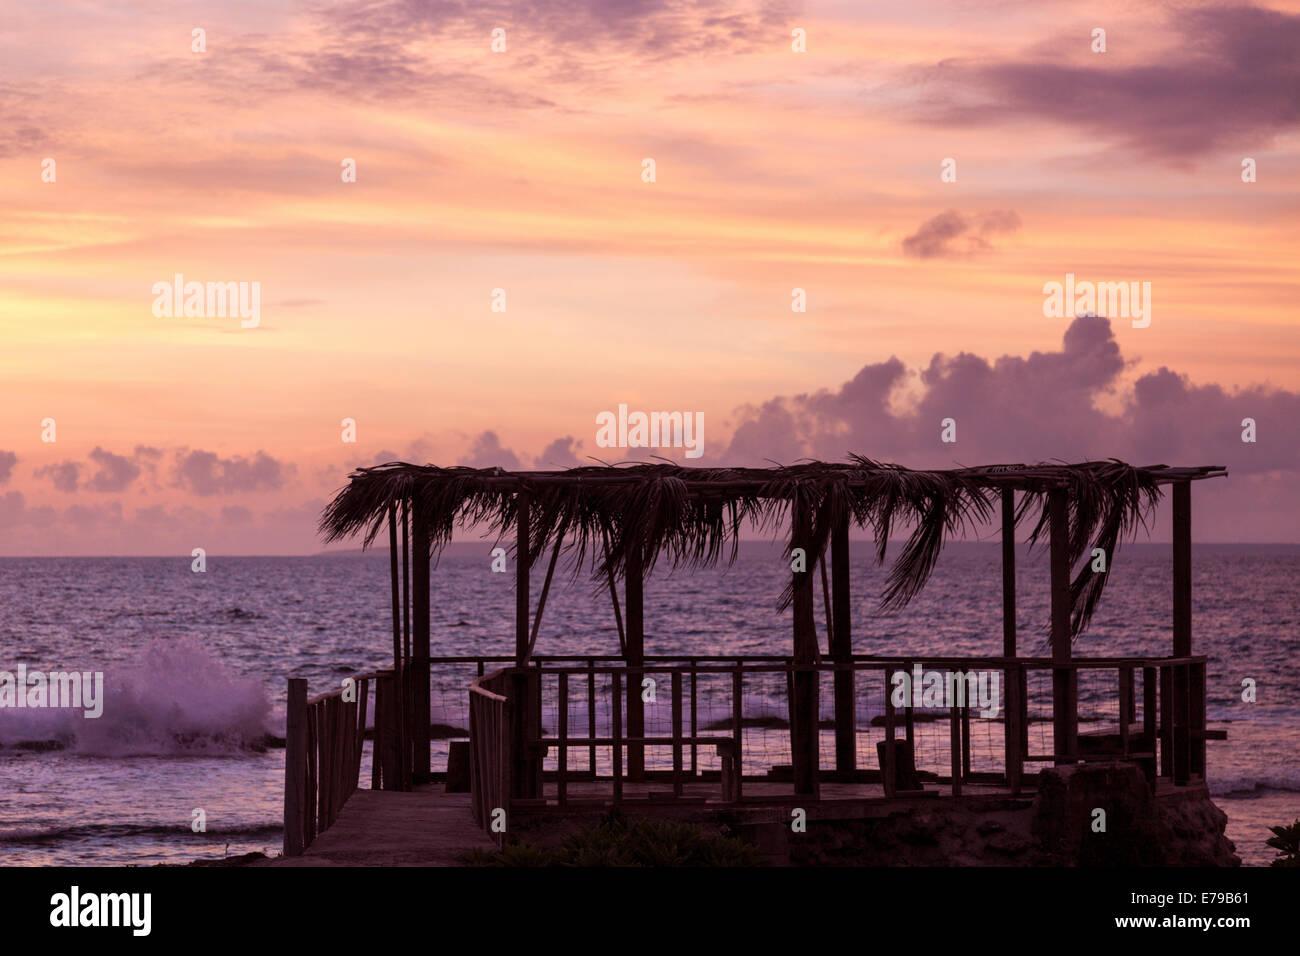 Tongan sunset - Eua Island. Tongatapu in the background. Stock Photo